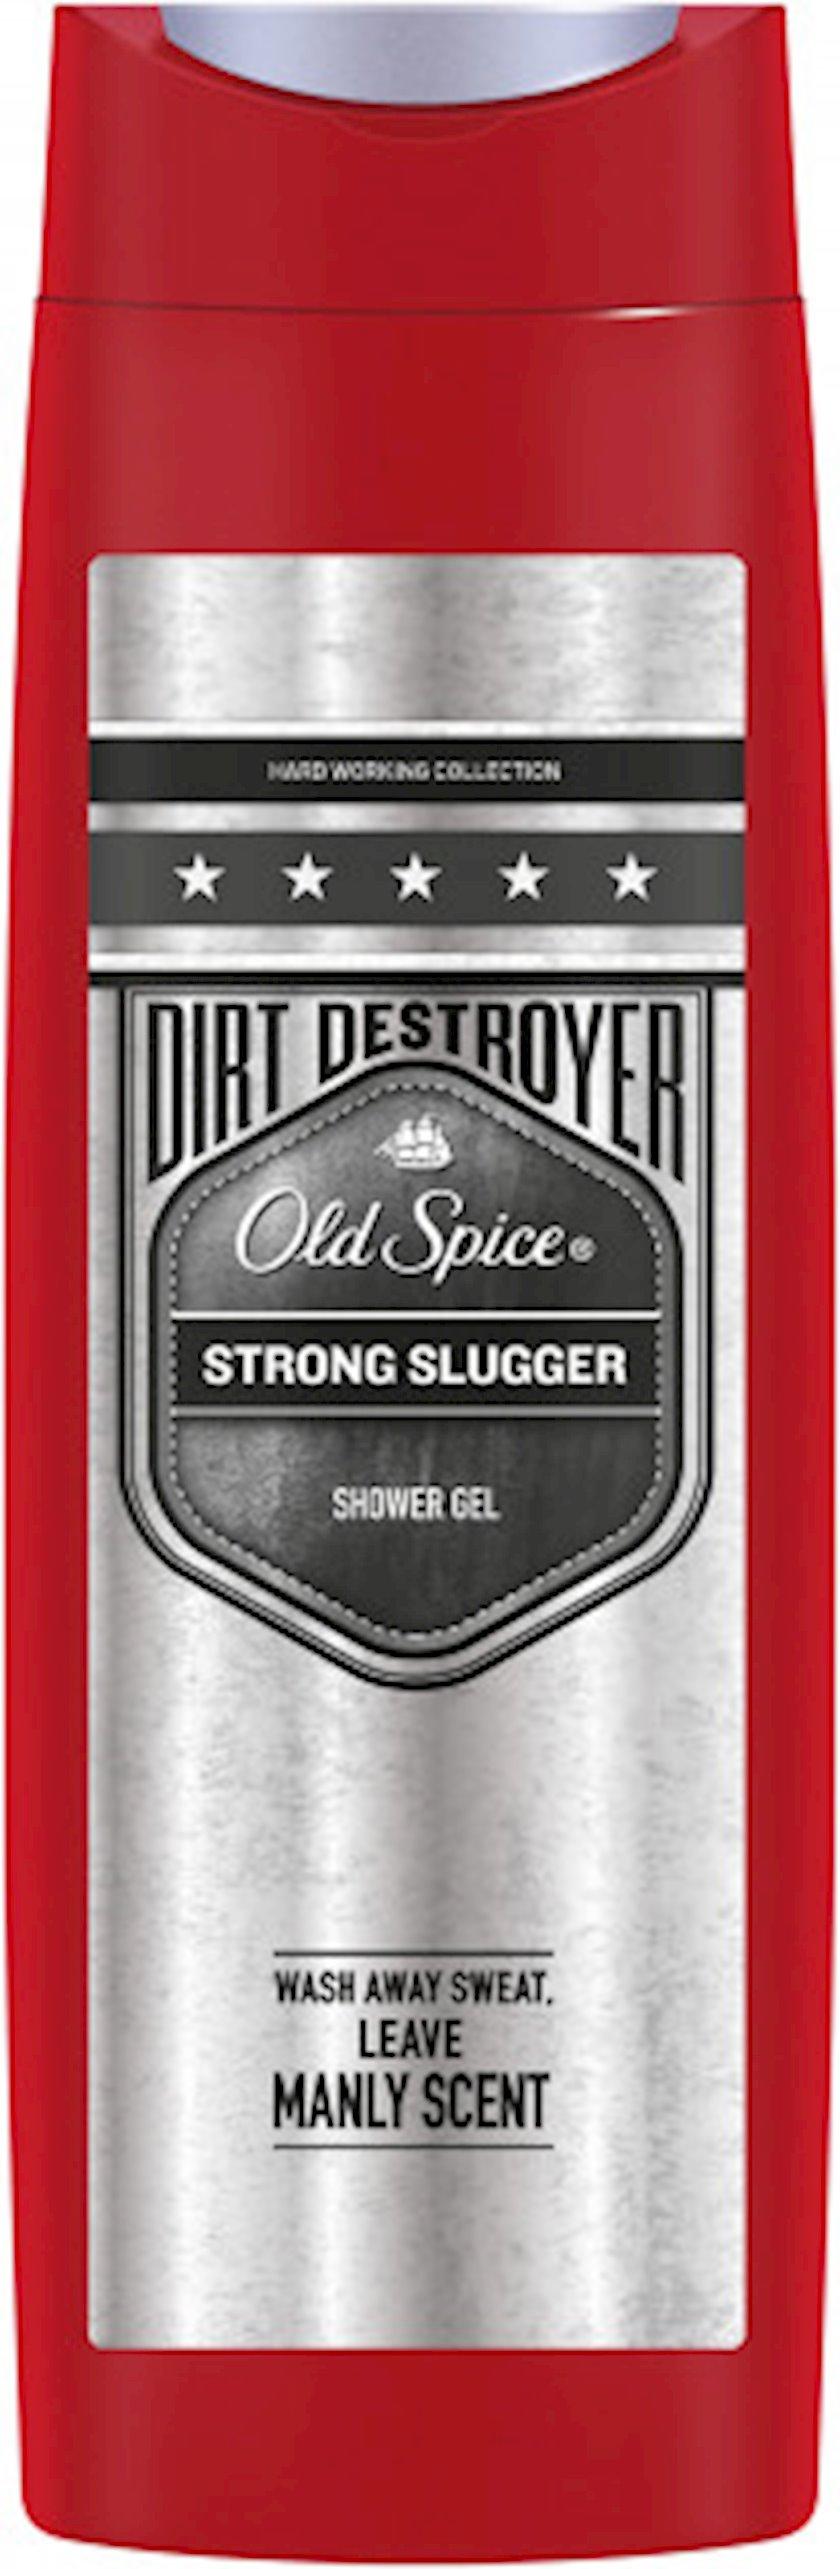 Duş üçün gel Old Spice Dirt Destroyer Strong Slugger 400 ml